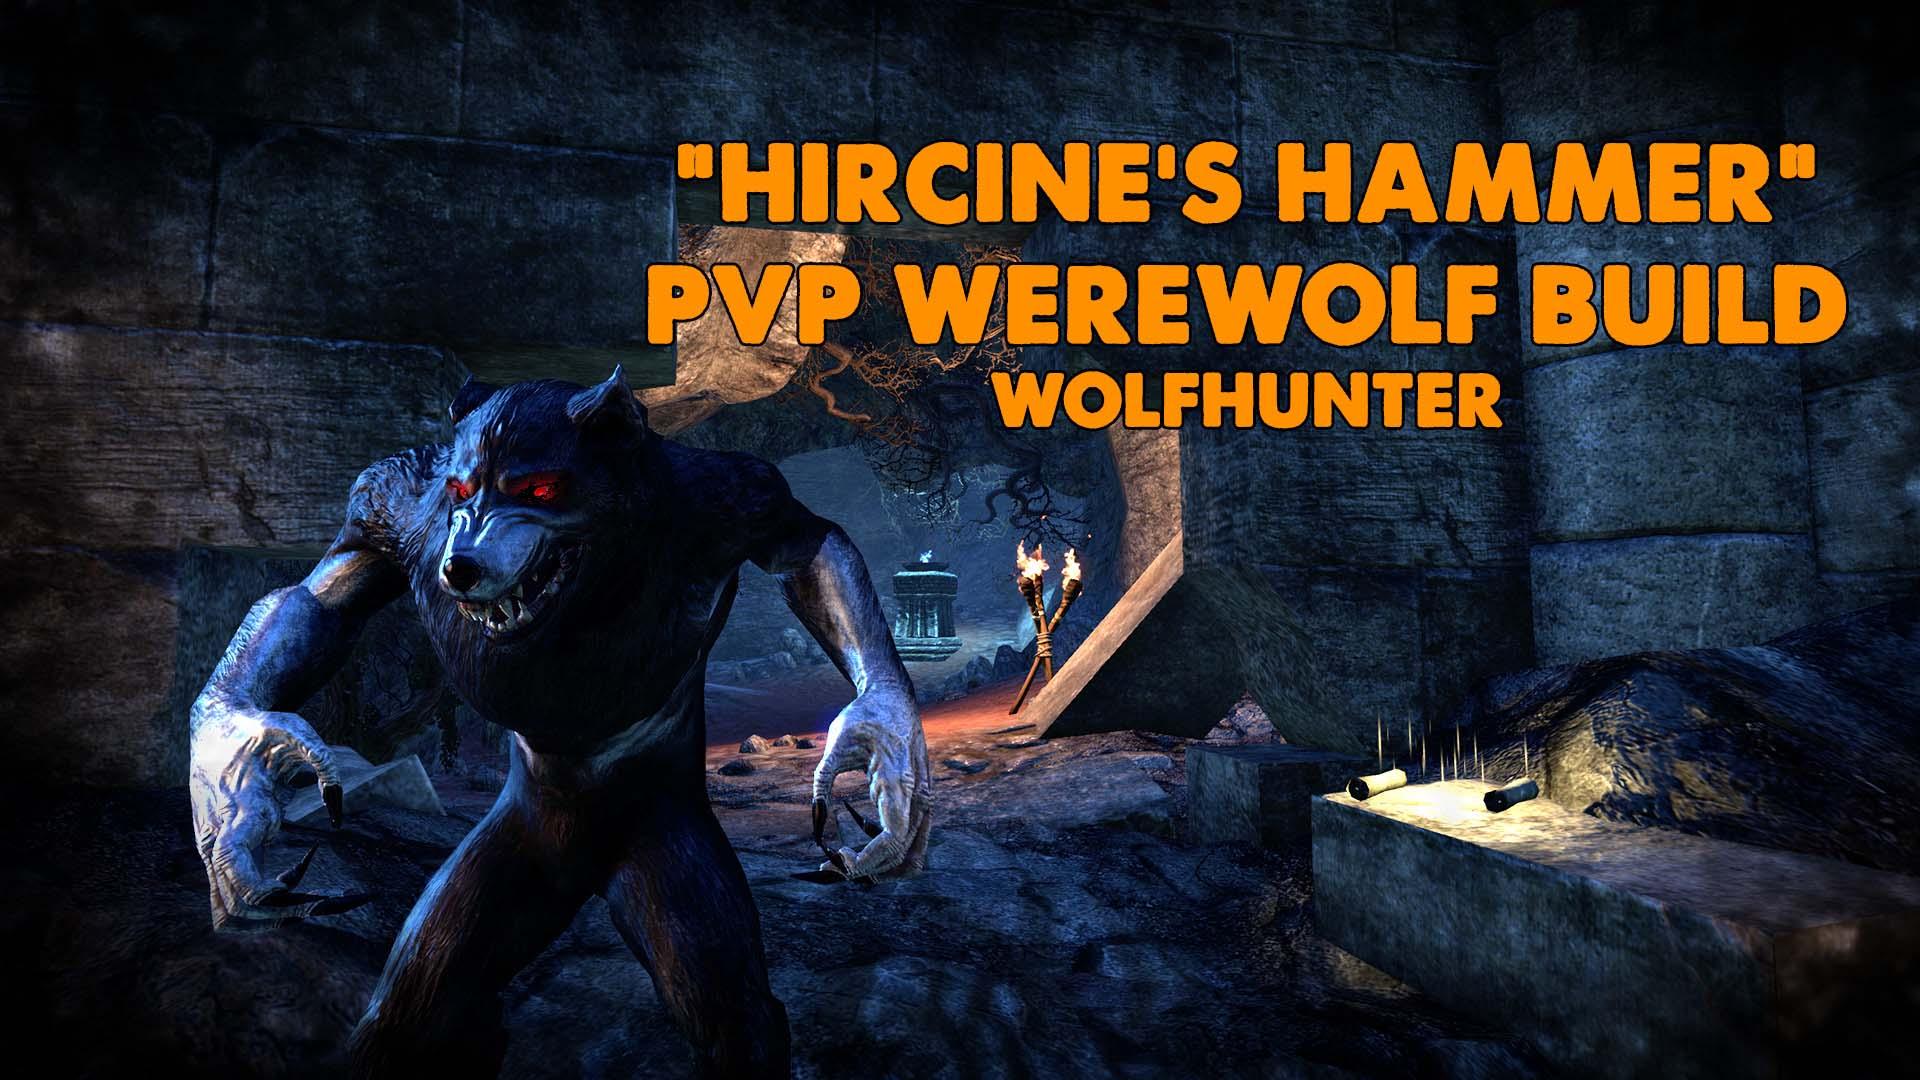 ww, werewolf, pvp werewolf, pvp nightblade, pvp nb, pvp ww, pvp berserker werewolf